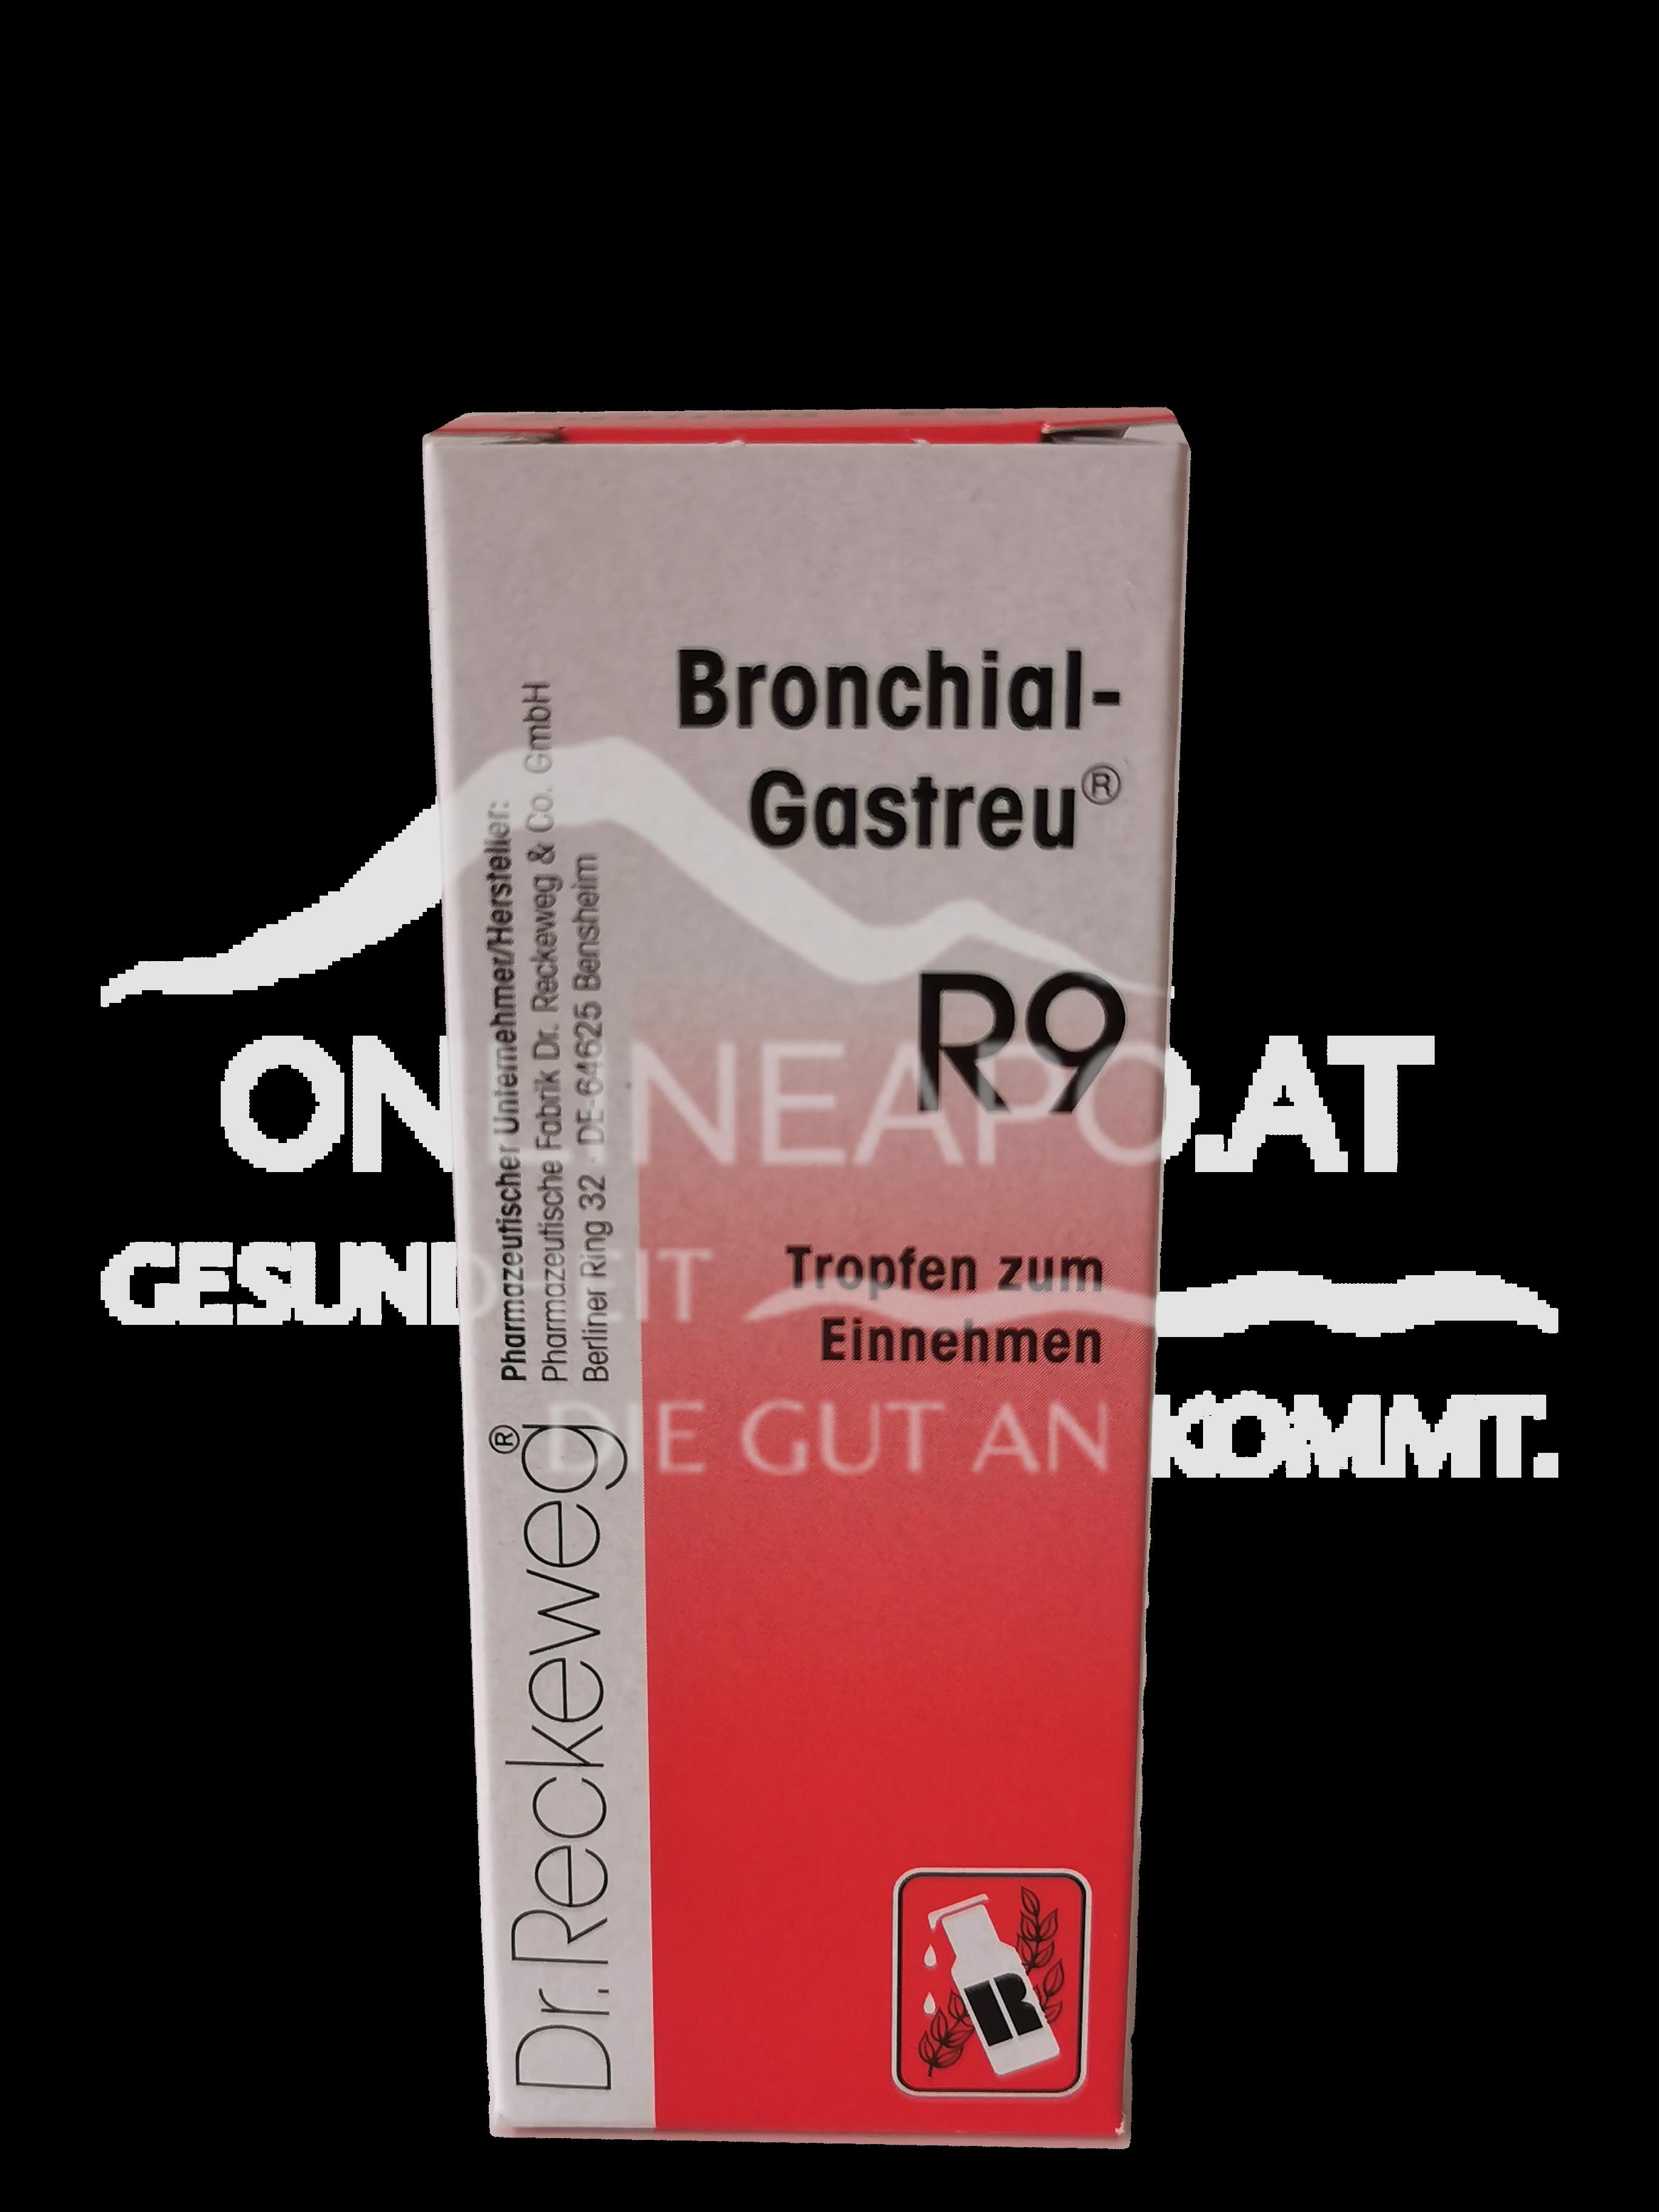 Dr. Reckeweg® Bronchial-Gastreu® R9